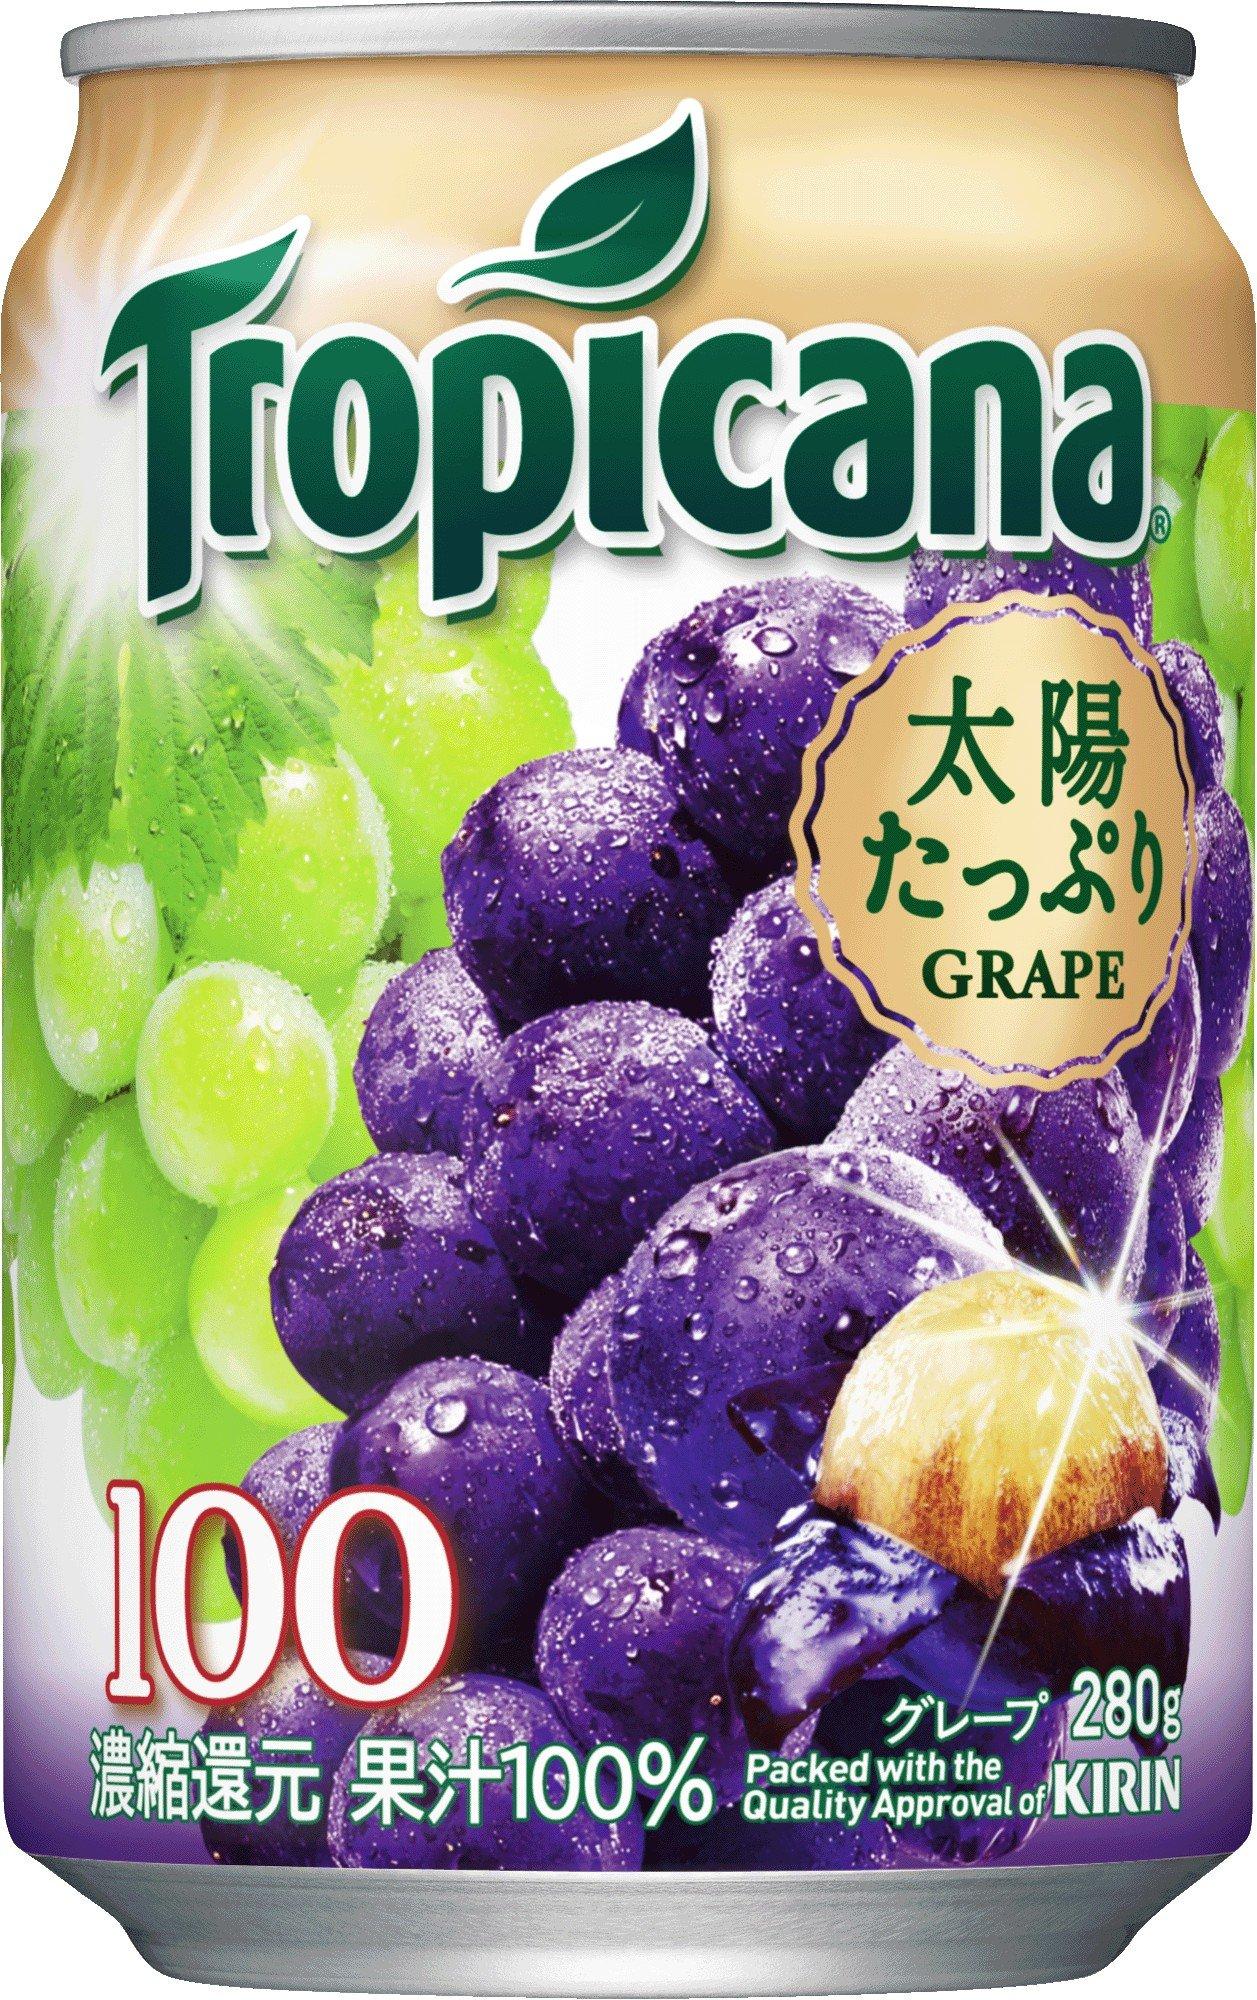 280gX24 this Tropicana 100% Grape